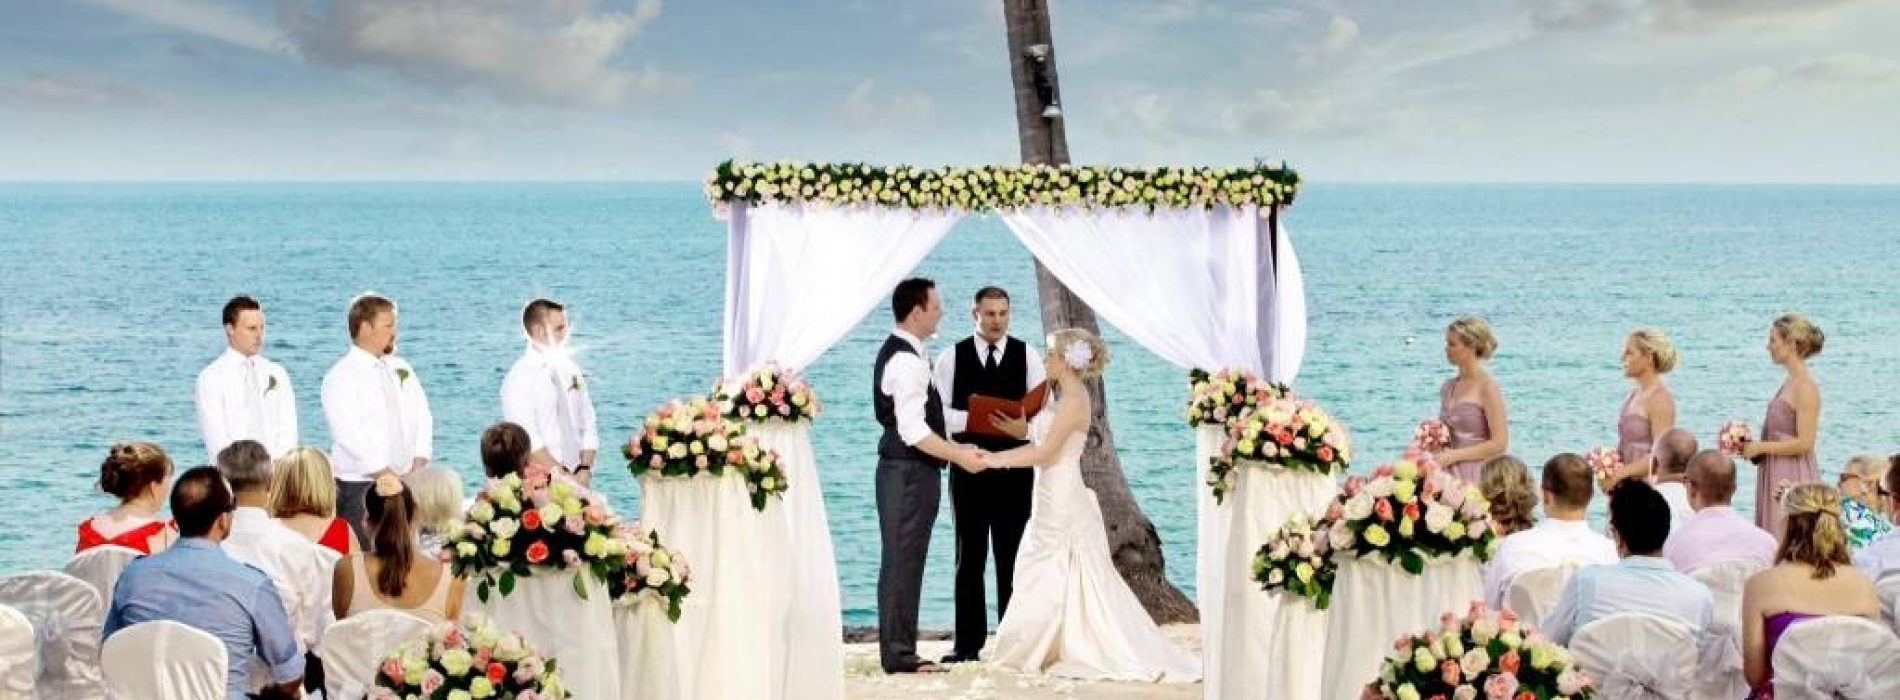 2013 Budget Wedding – How to Buy Cheap Wedding Dresses